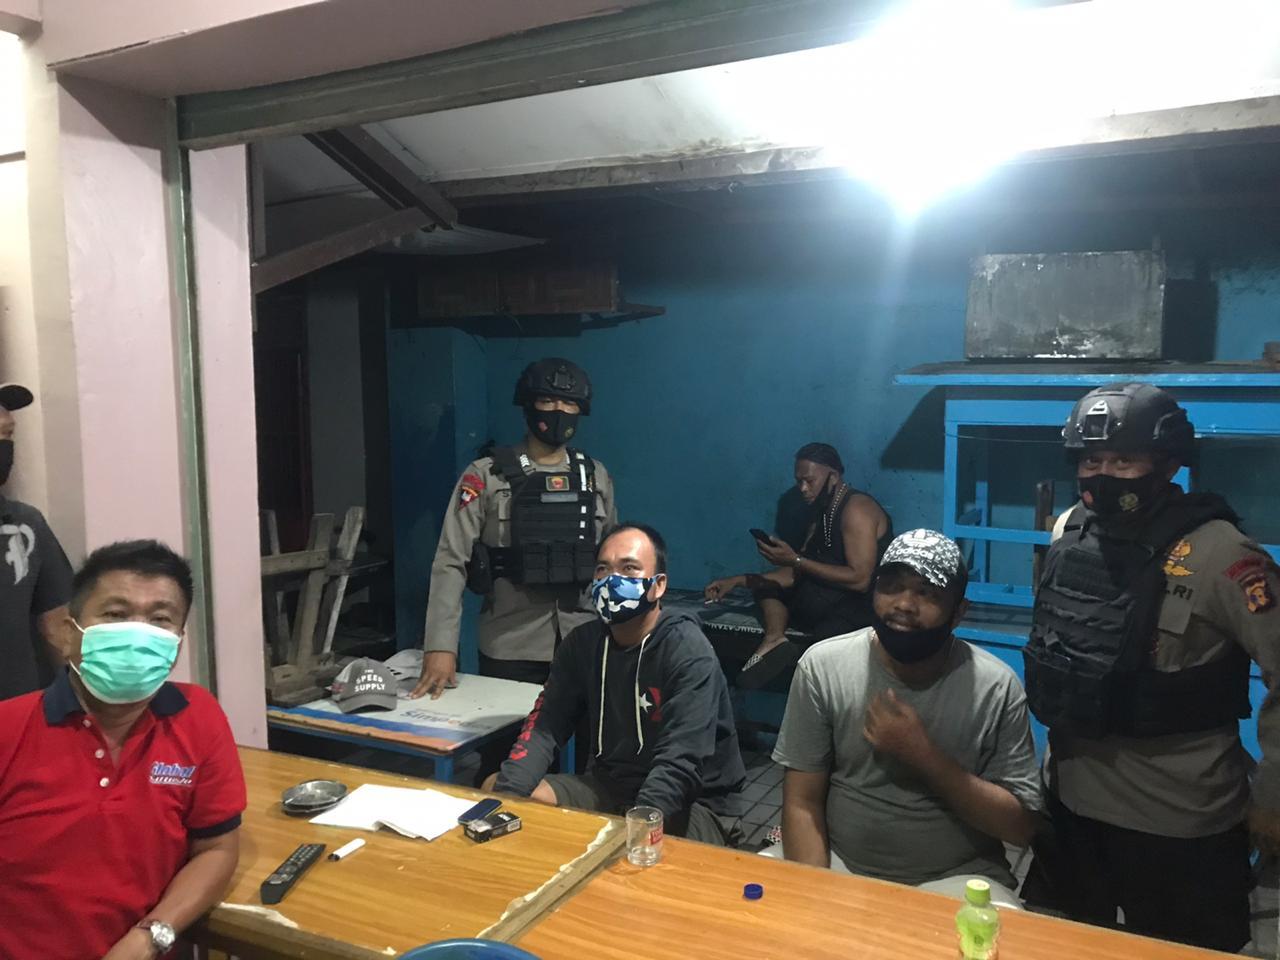 Dialogis Dengan Masyarakat Balikpapan Di Pemukiman, Brimob Batalyon A Pelopor Himbau Patuhi Prokes Dan Terapkan 3M